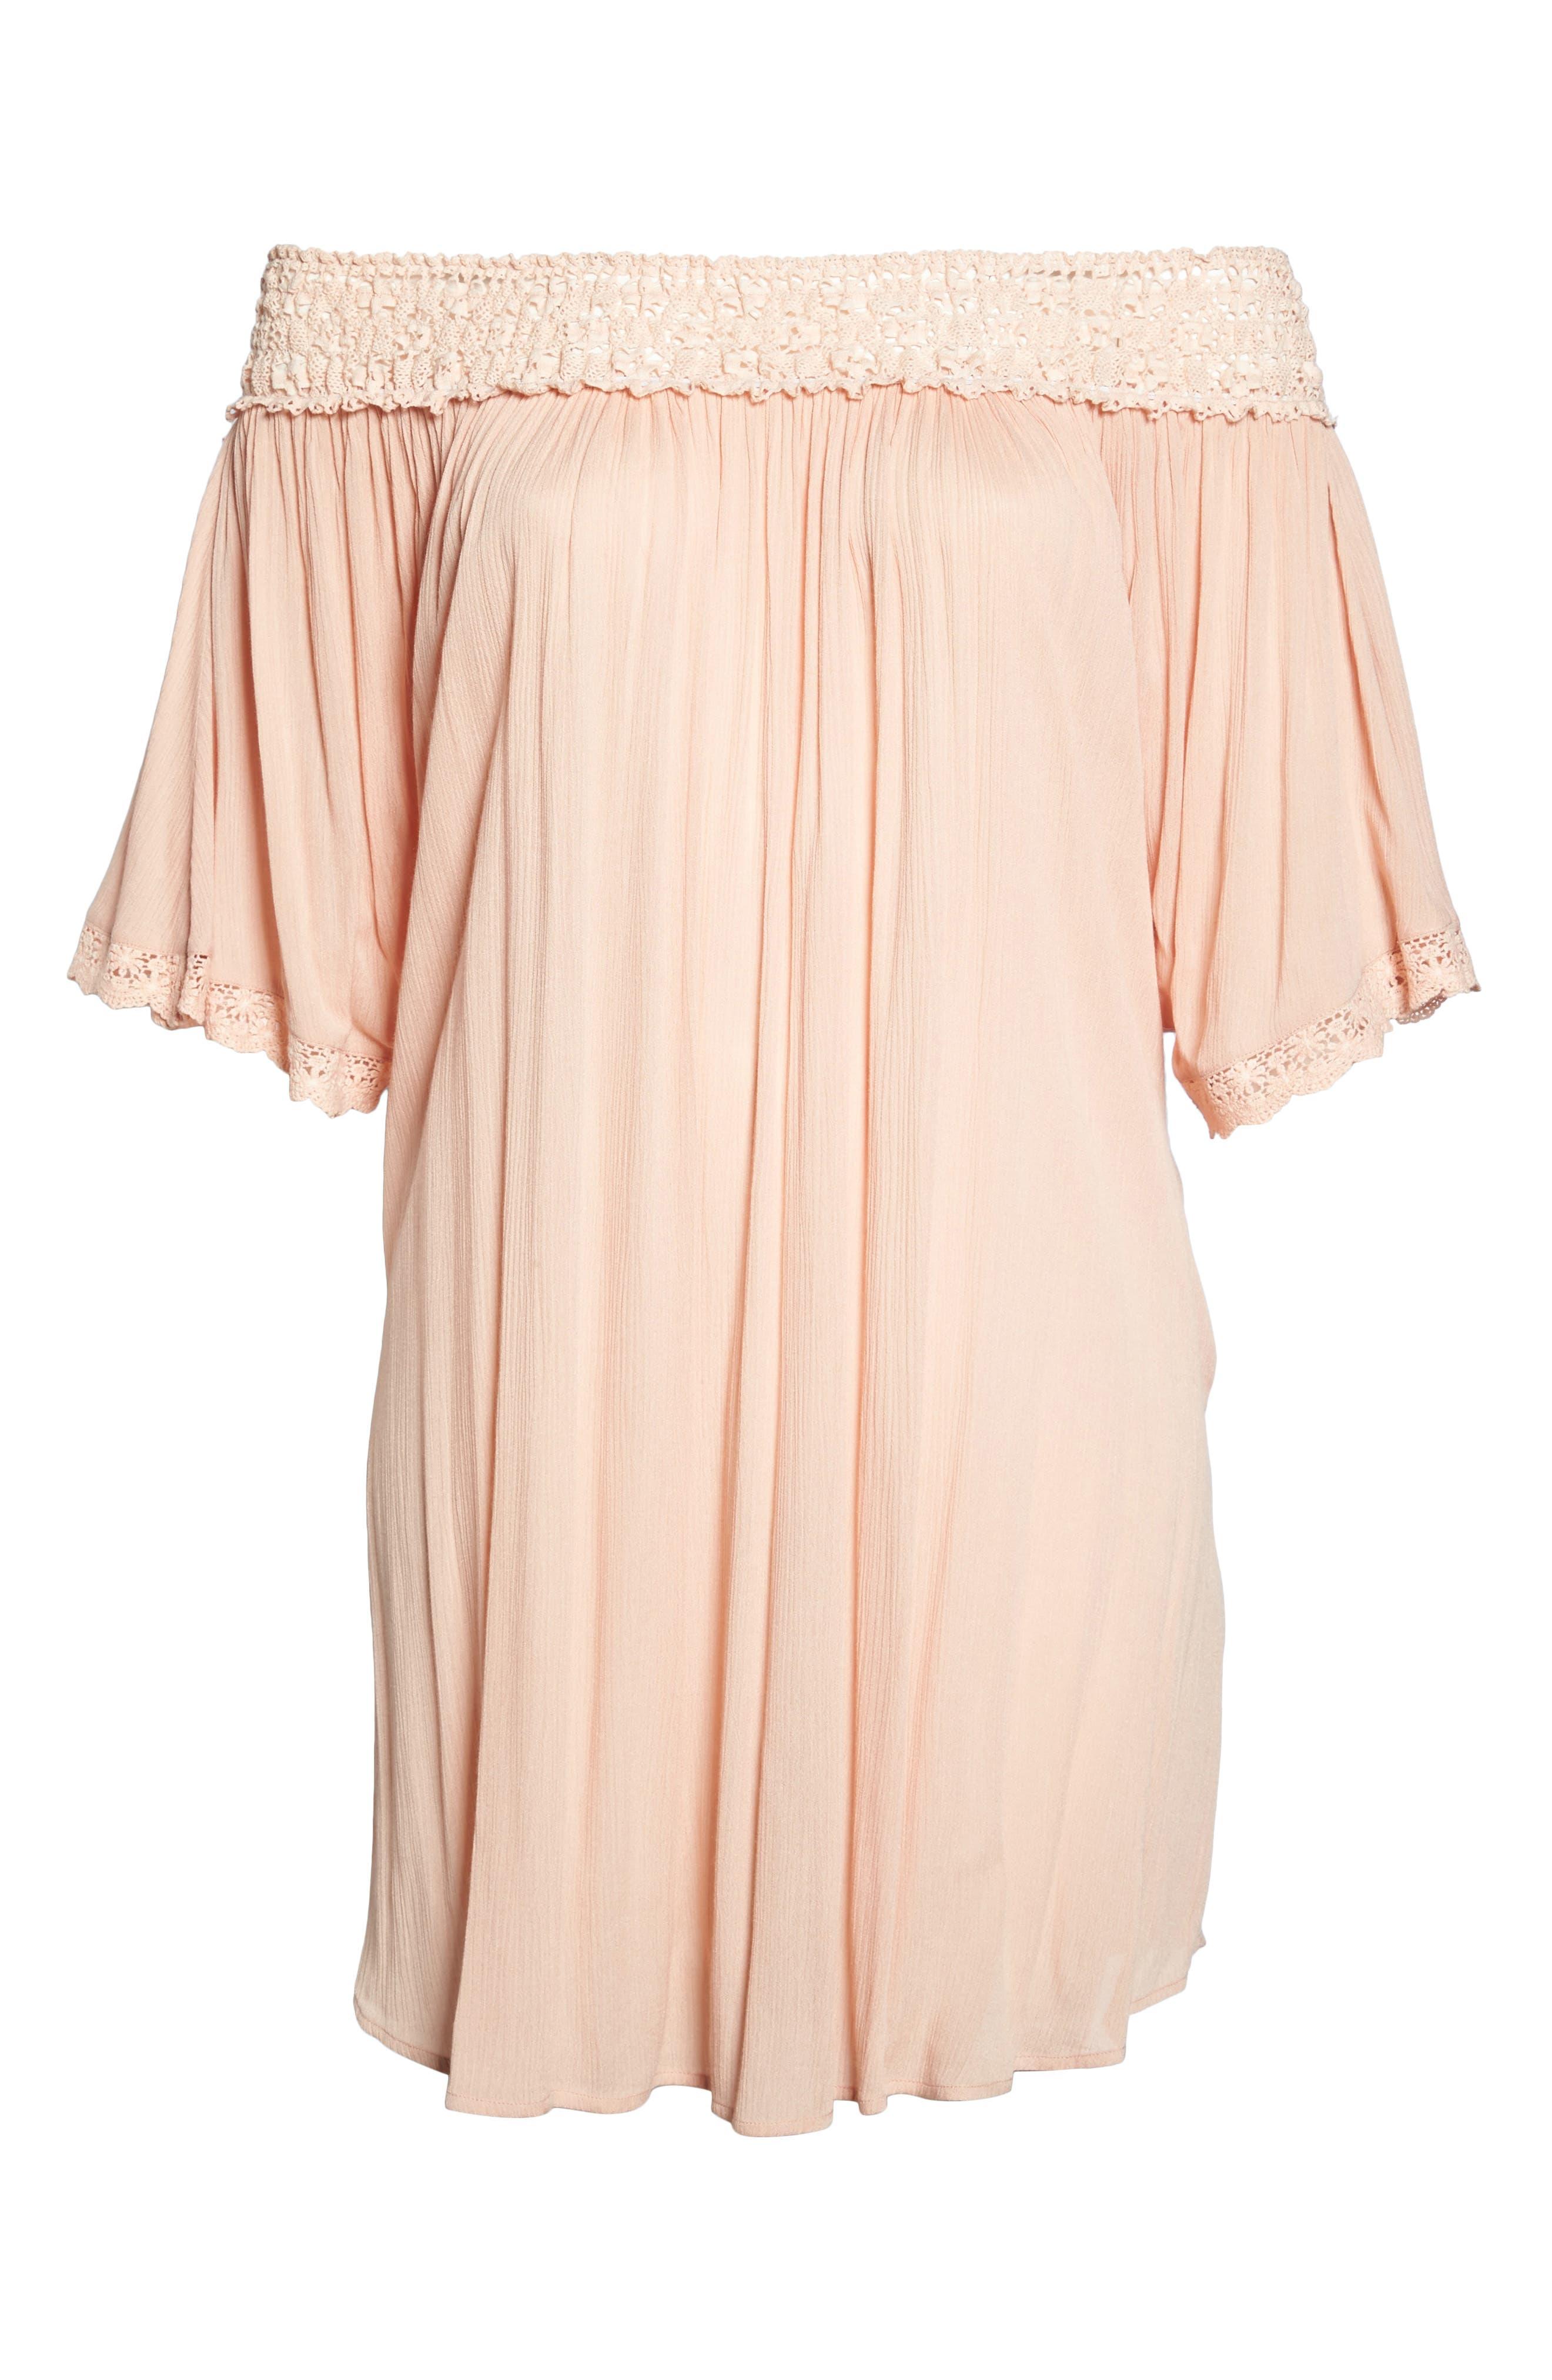 Rimini Crochet Cover-Up Dress,                             Alternate thumbnail 6, color,                             Pink